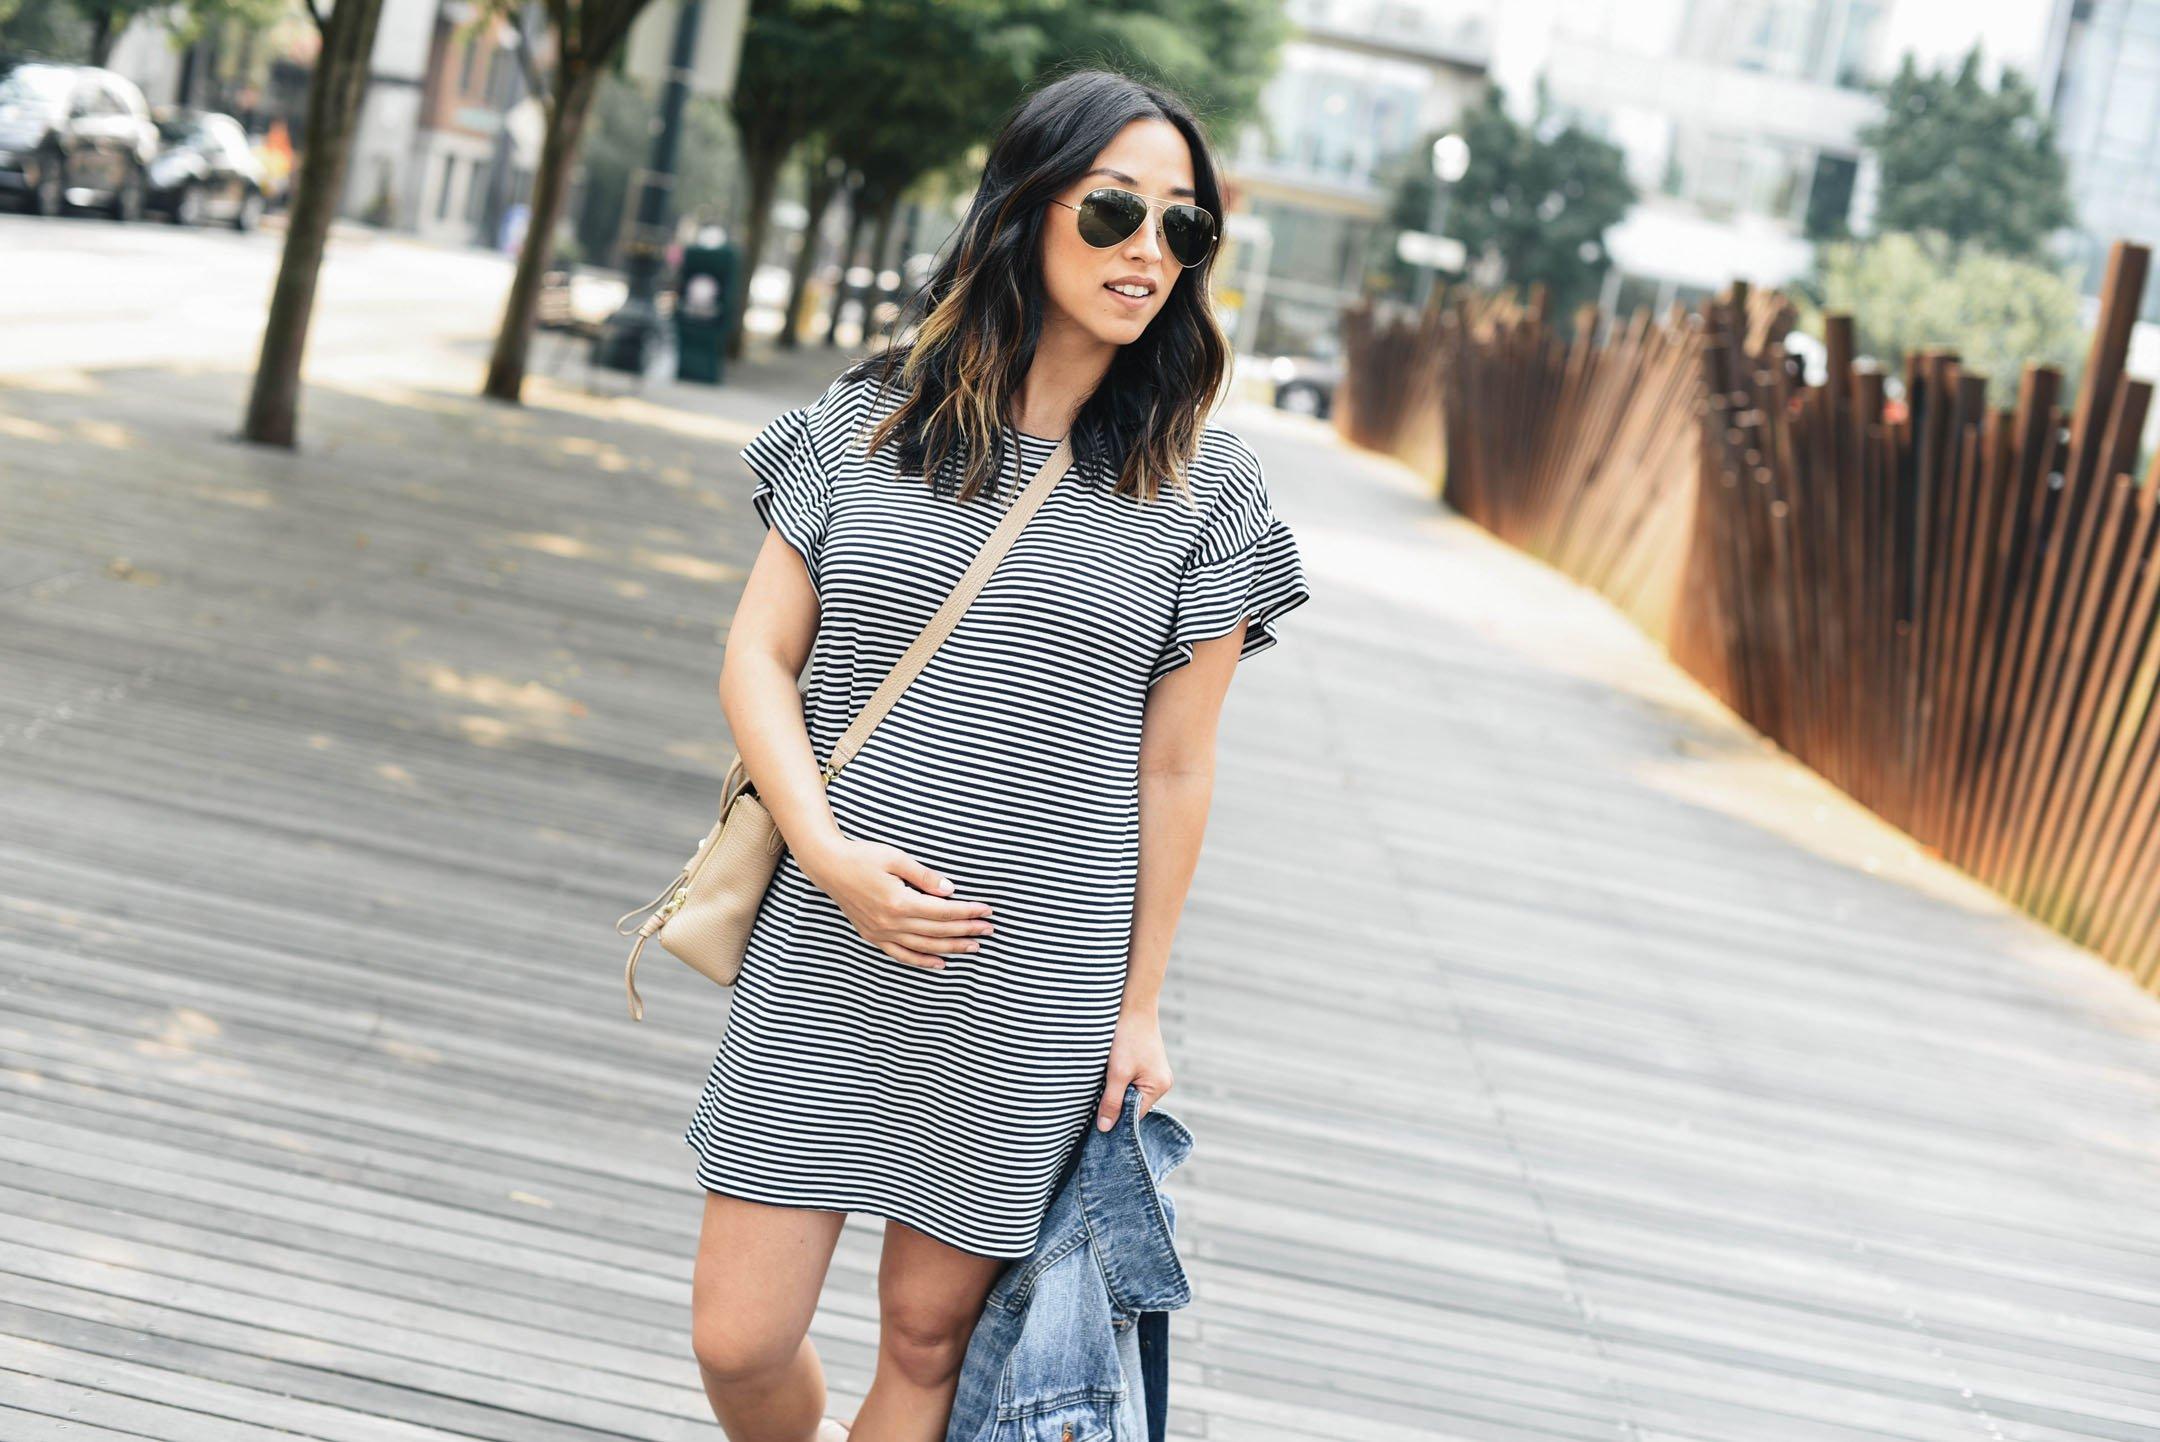 Crystalin marie's maternity style